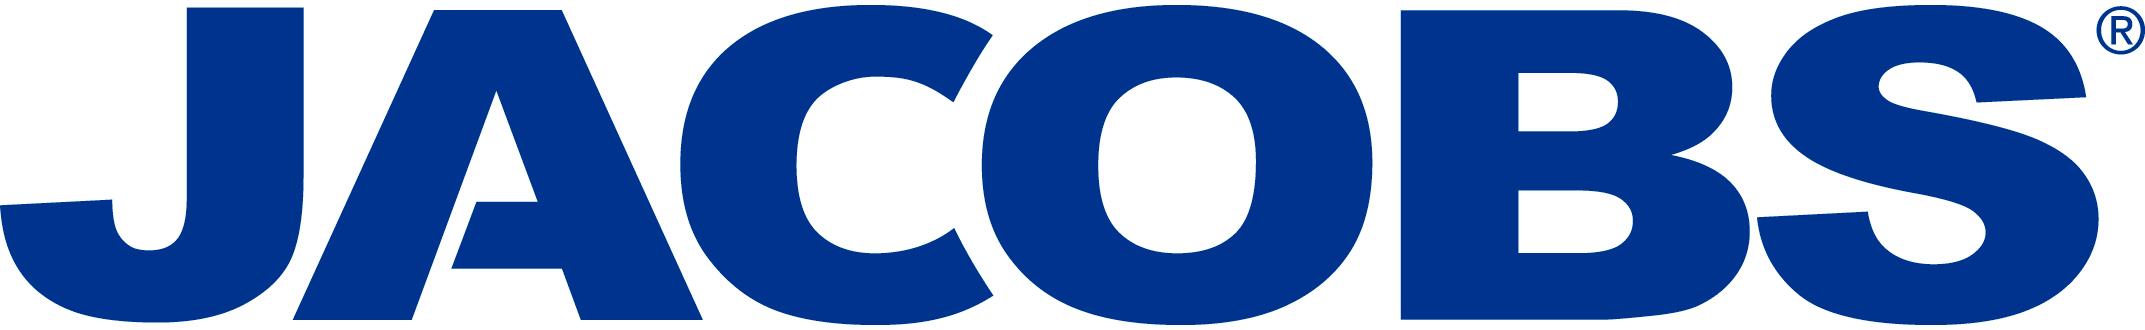 jacobs-logo_blue.jpg